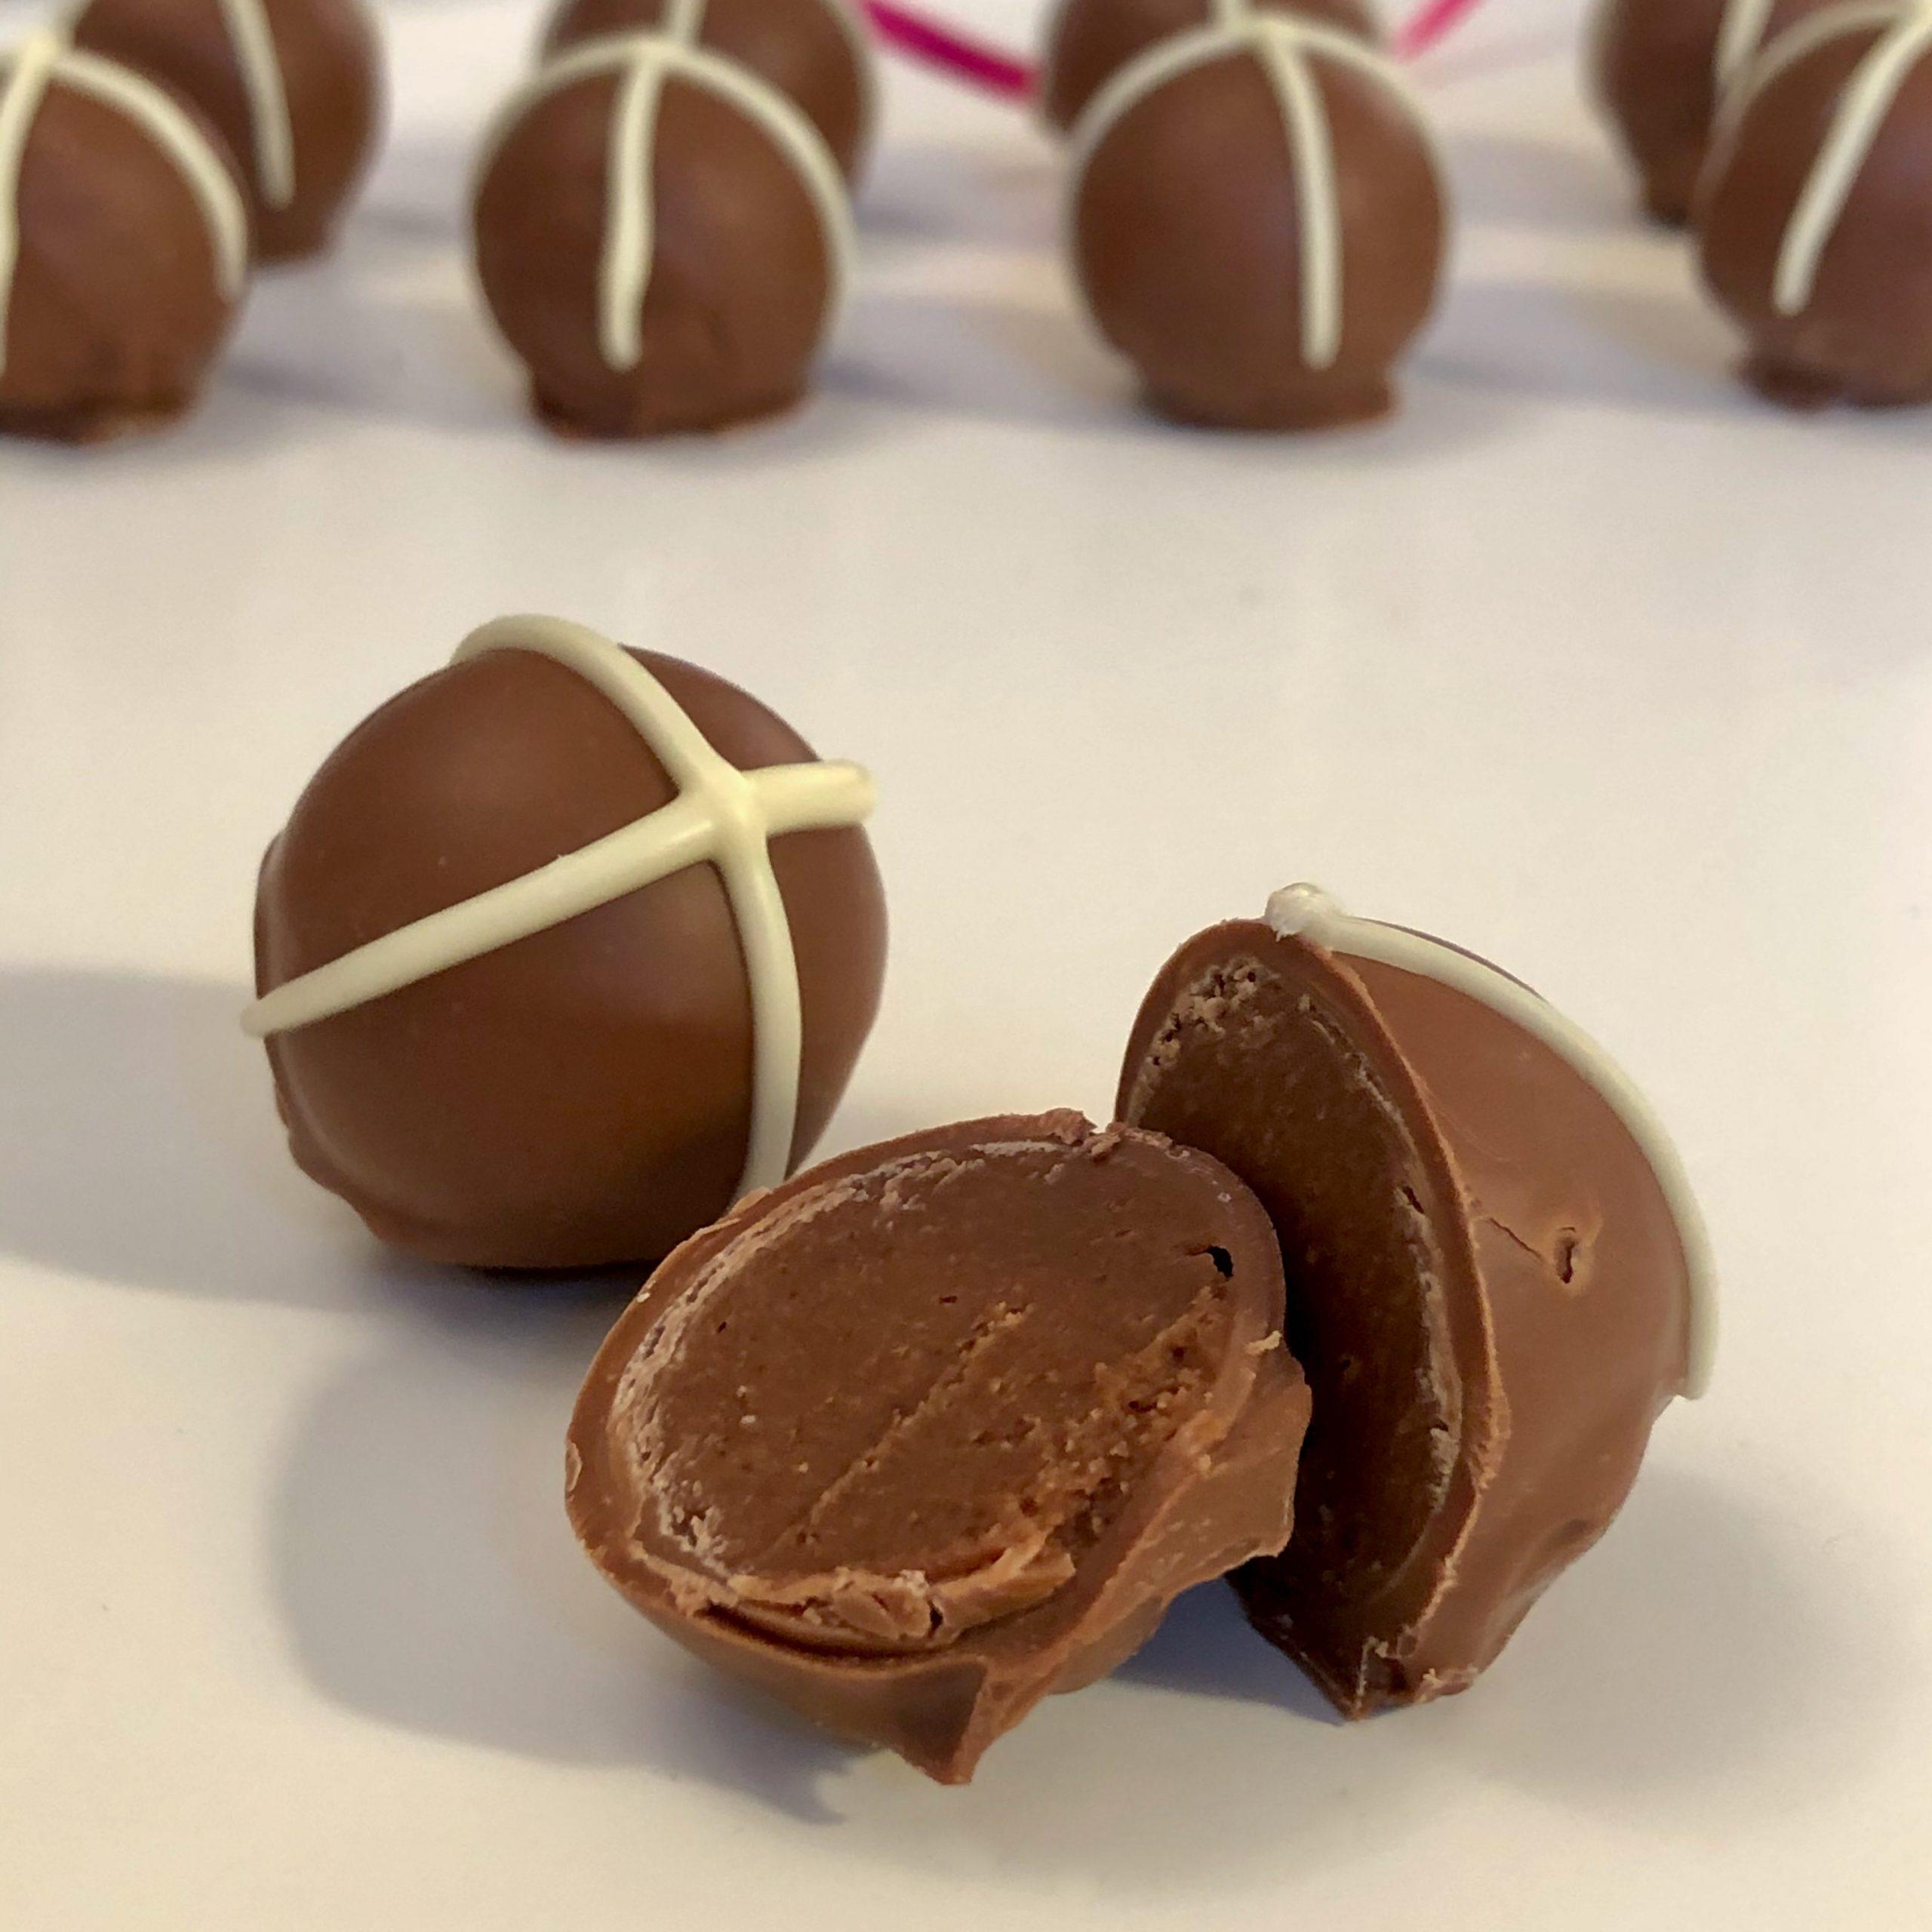 Assorted Chocolate Hot Cross Bun Easter Truffles (box of